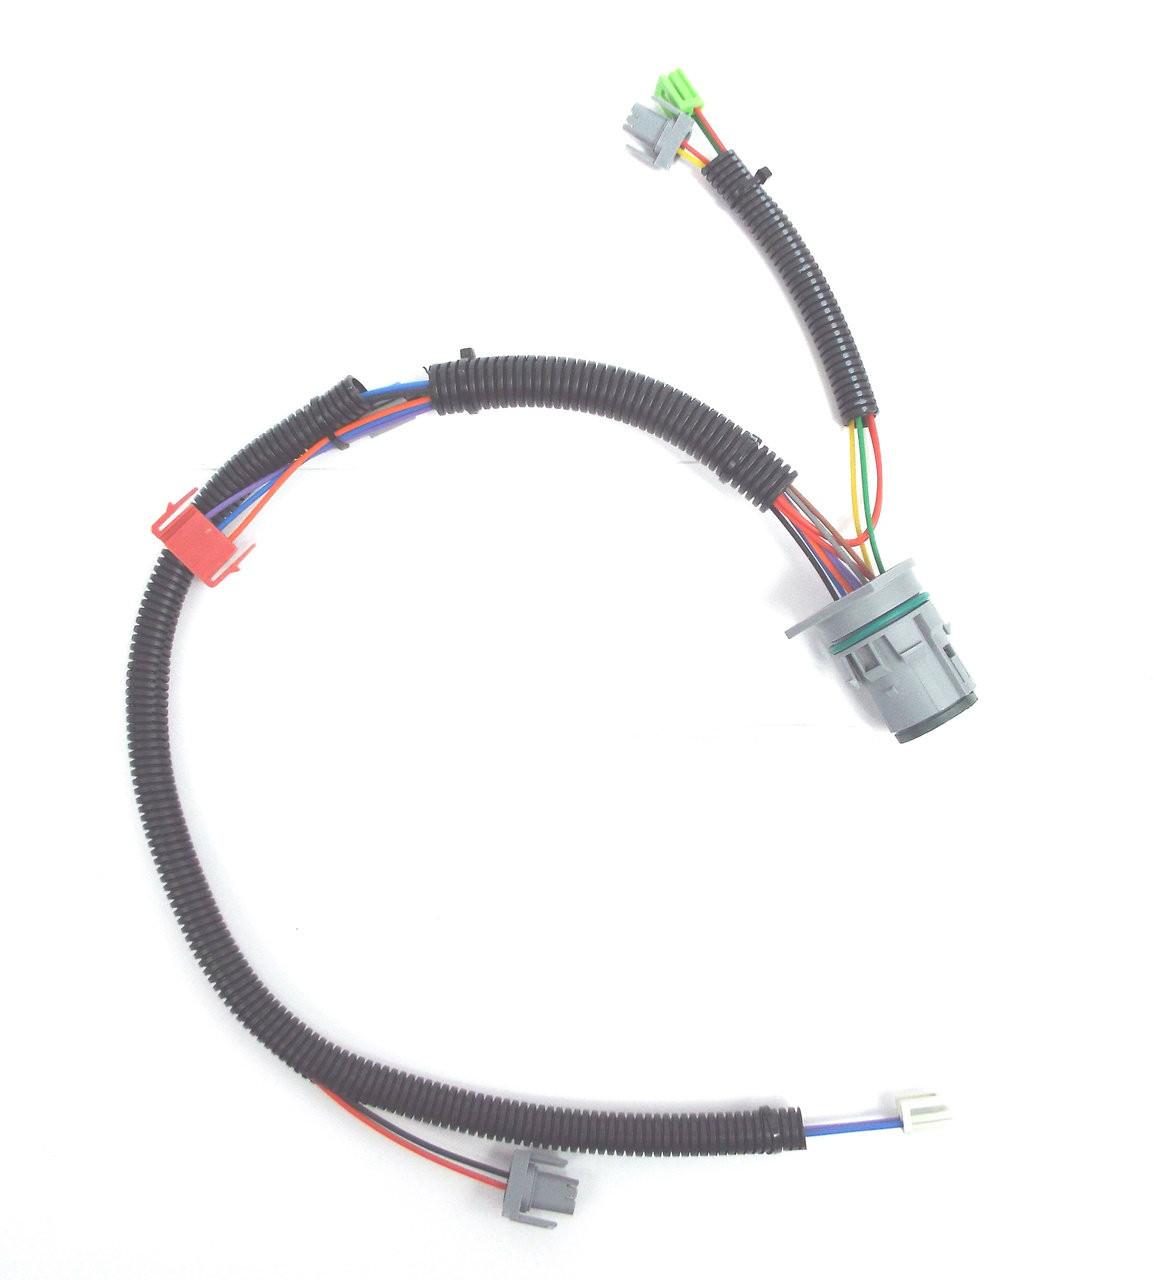 medium resolution of 4l80e internal wiring harness 2004 up 24200161 global 4l80e wiring harness diagram 4l80e wiring harness